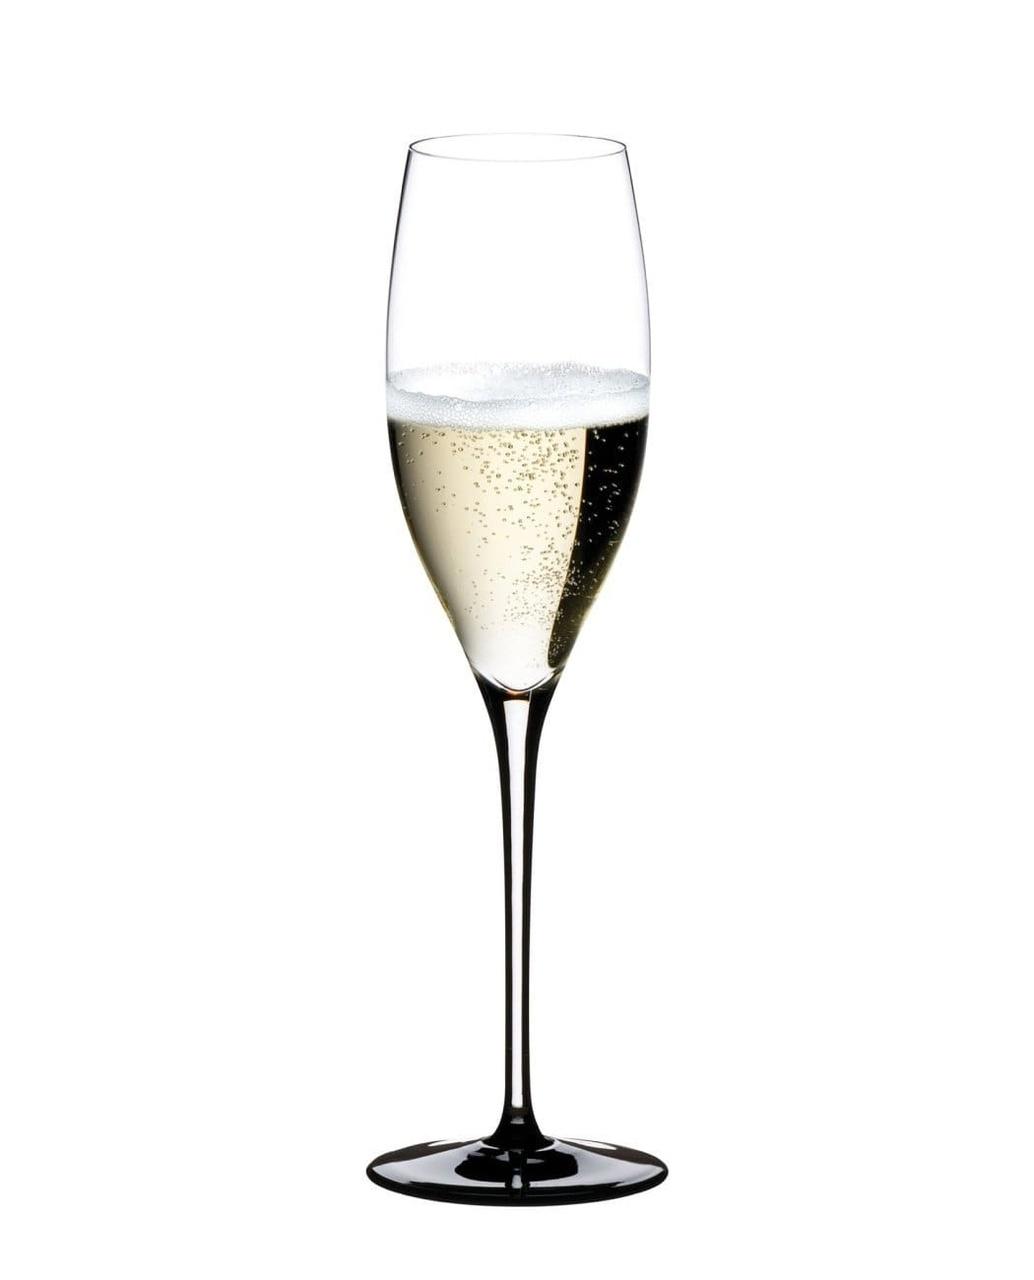 Pahar Riedel Vintage Champagne 4100/28